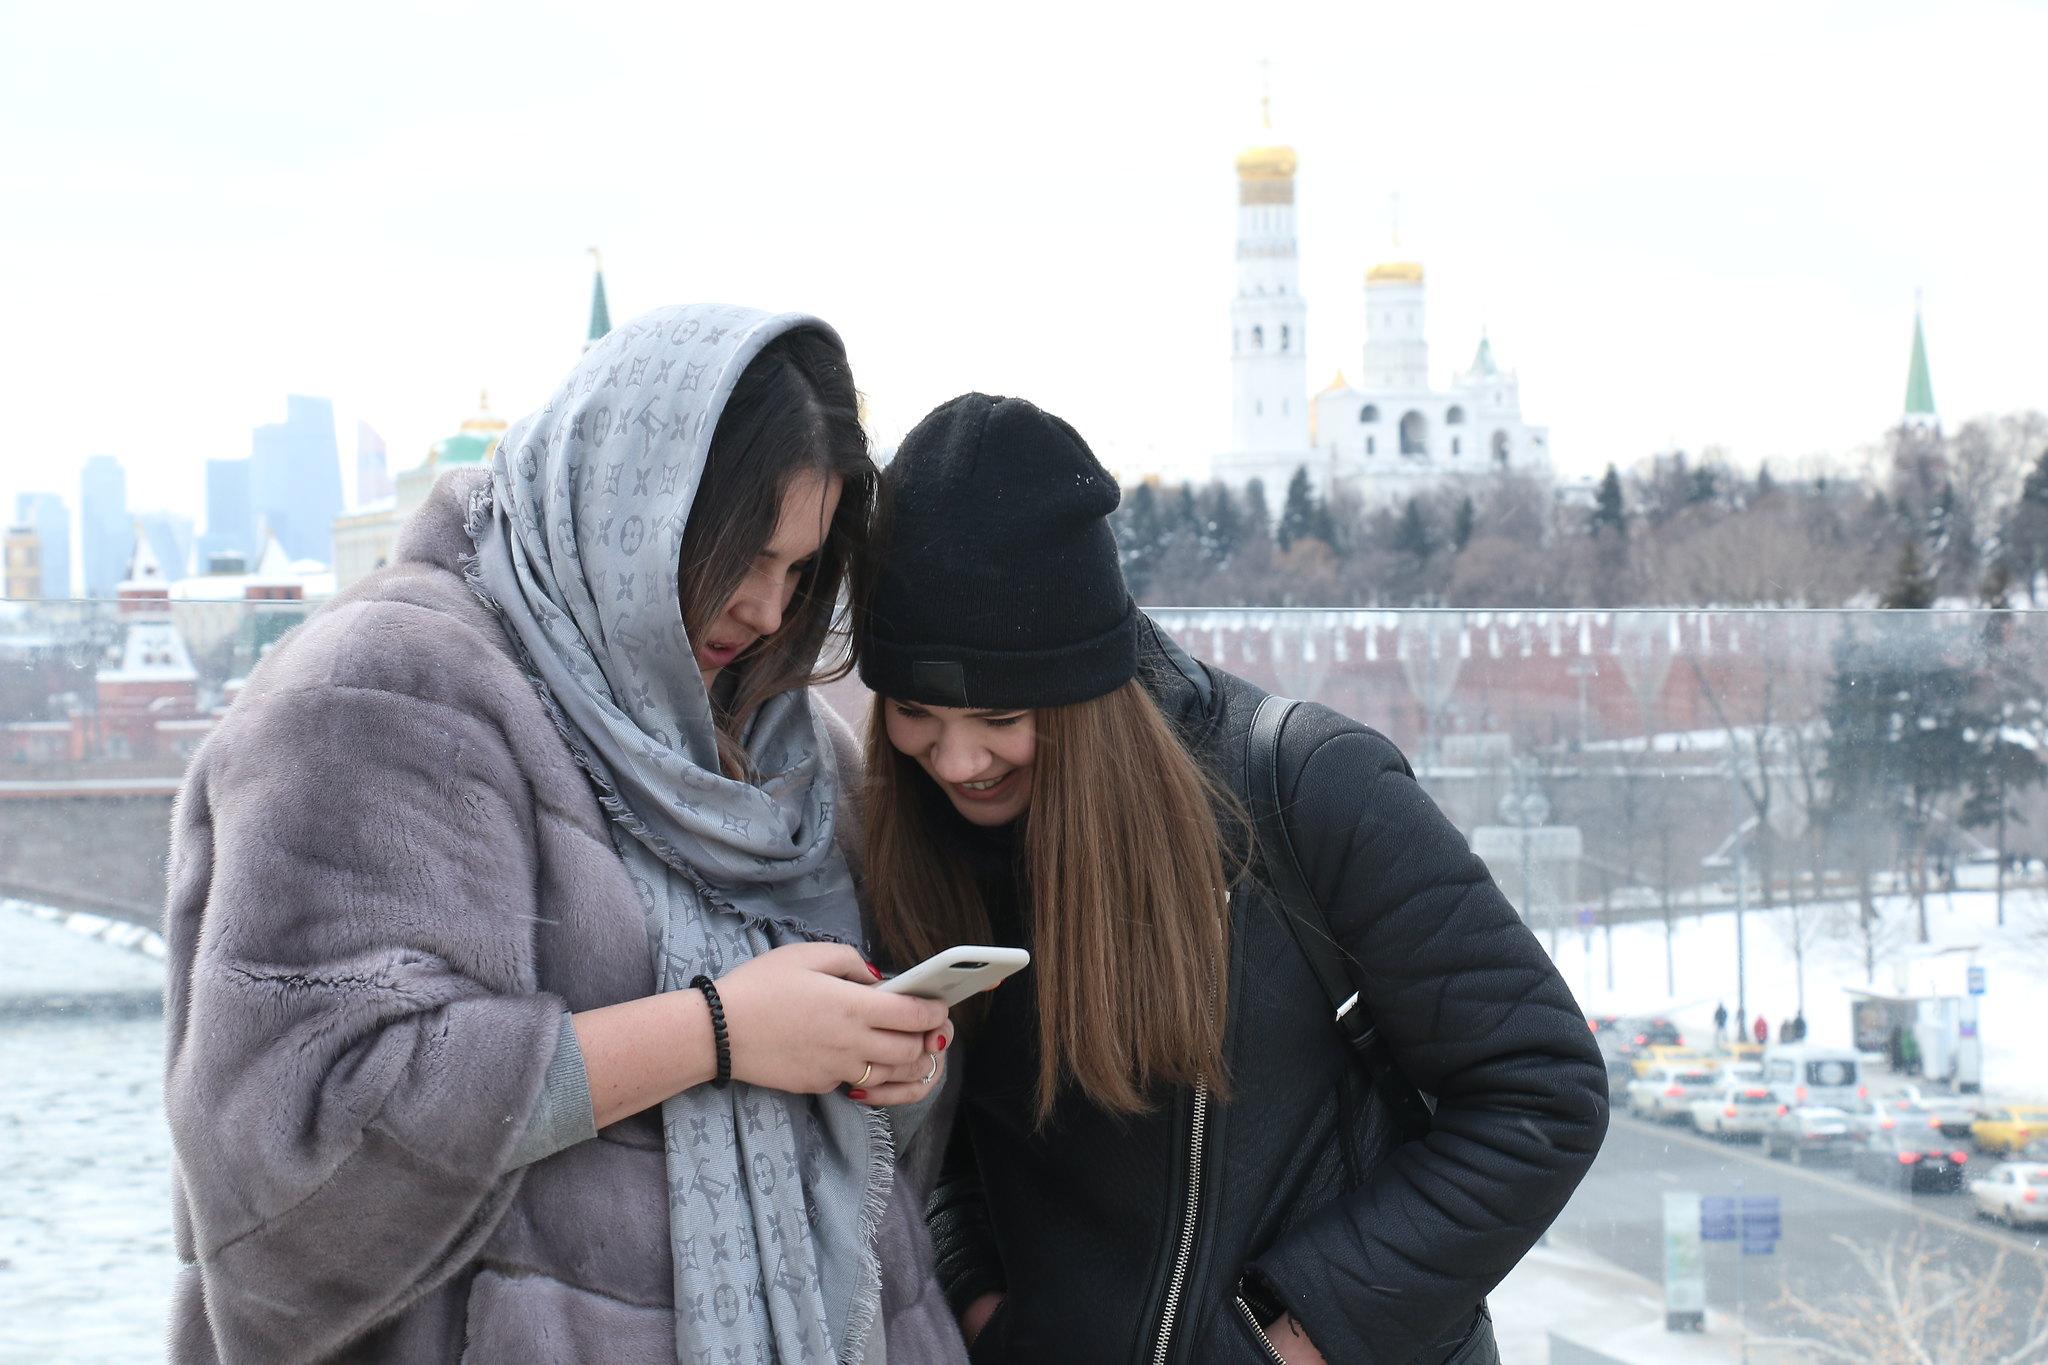 Moskva_23fev18_199